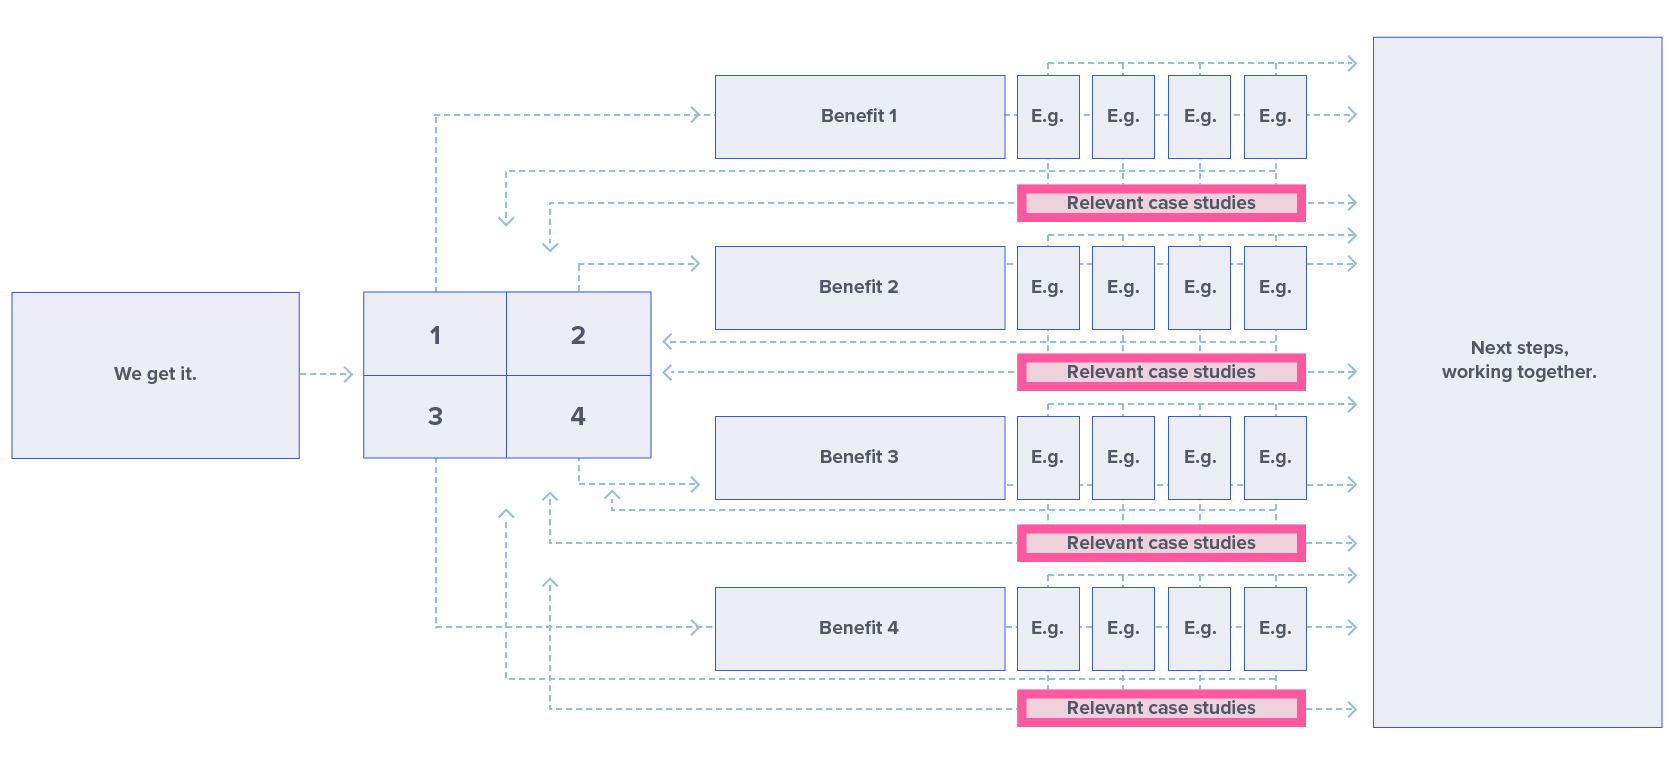 Presenation-diagrams-13.jpg